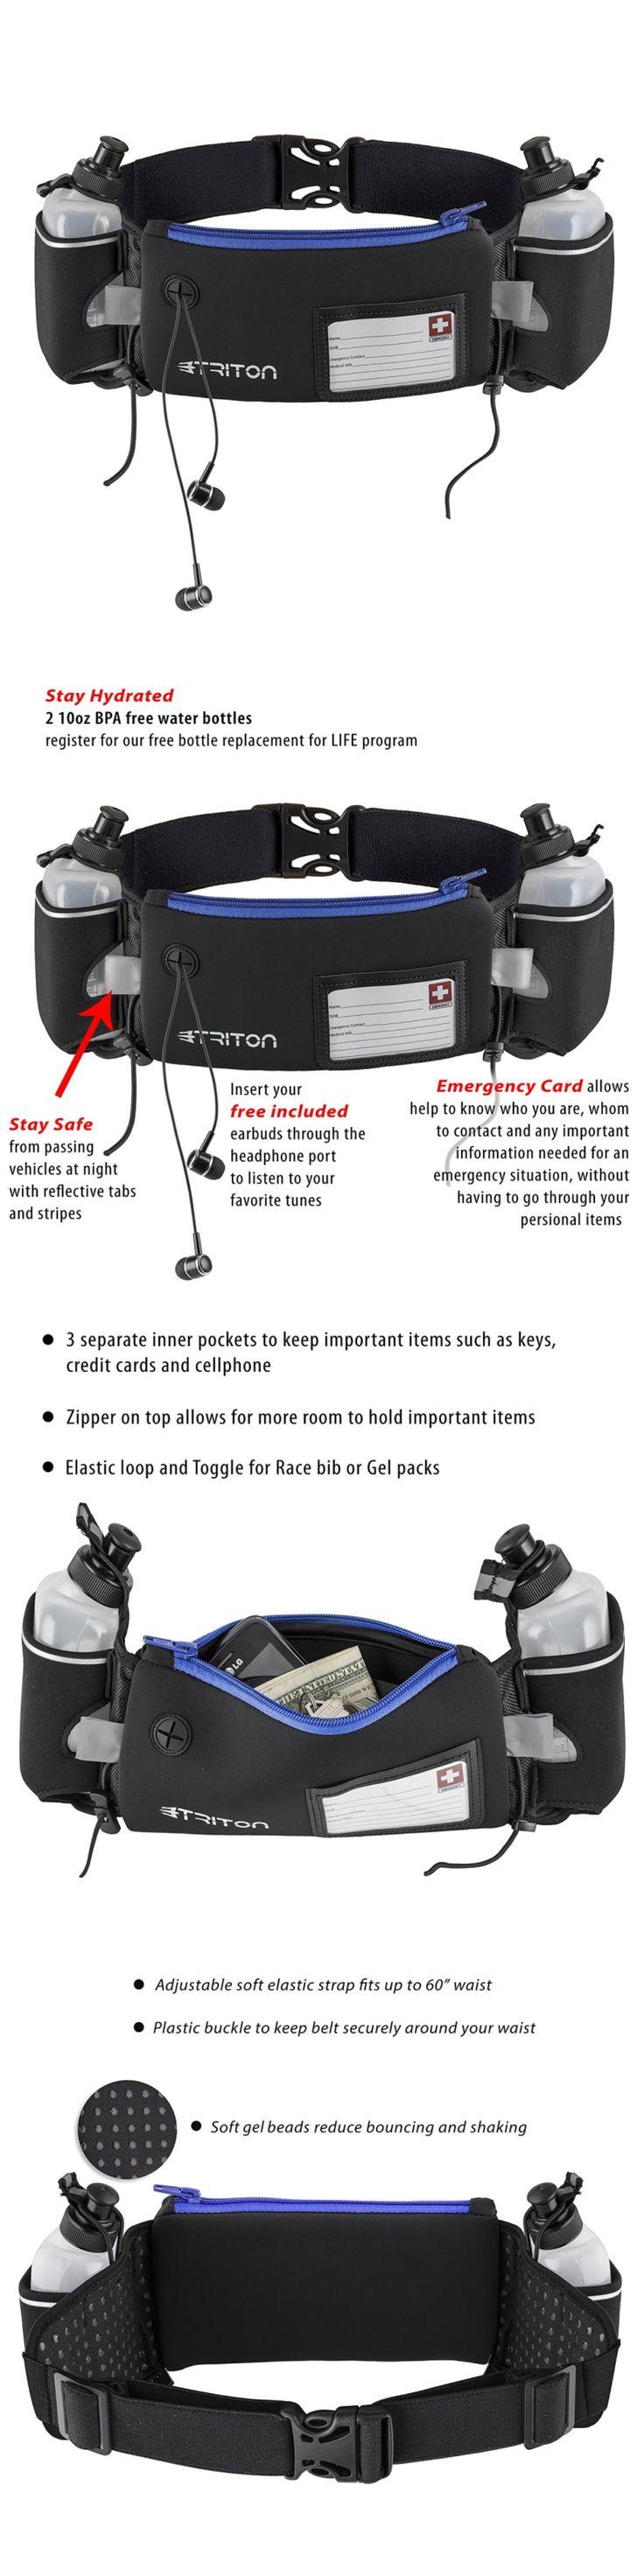 Running Belts 179802: Hydration Running Belt - Free Headphones - 2 Bpa Free Water Bottles - Emergency -> BUY IT NOW ONLY: $31.34 on eBay!